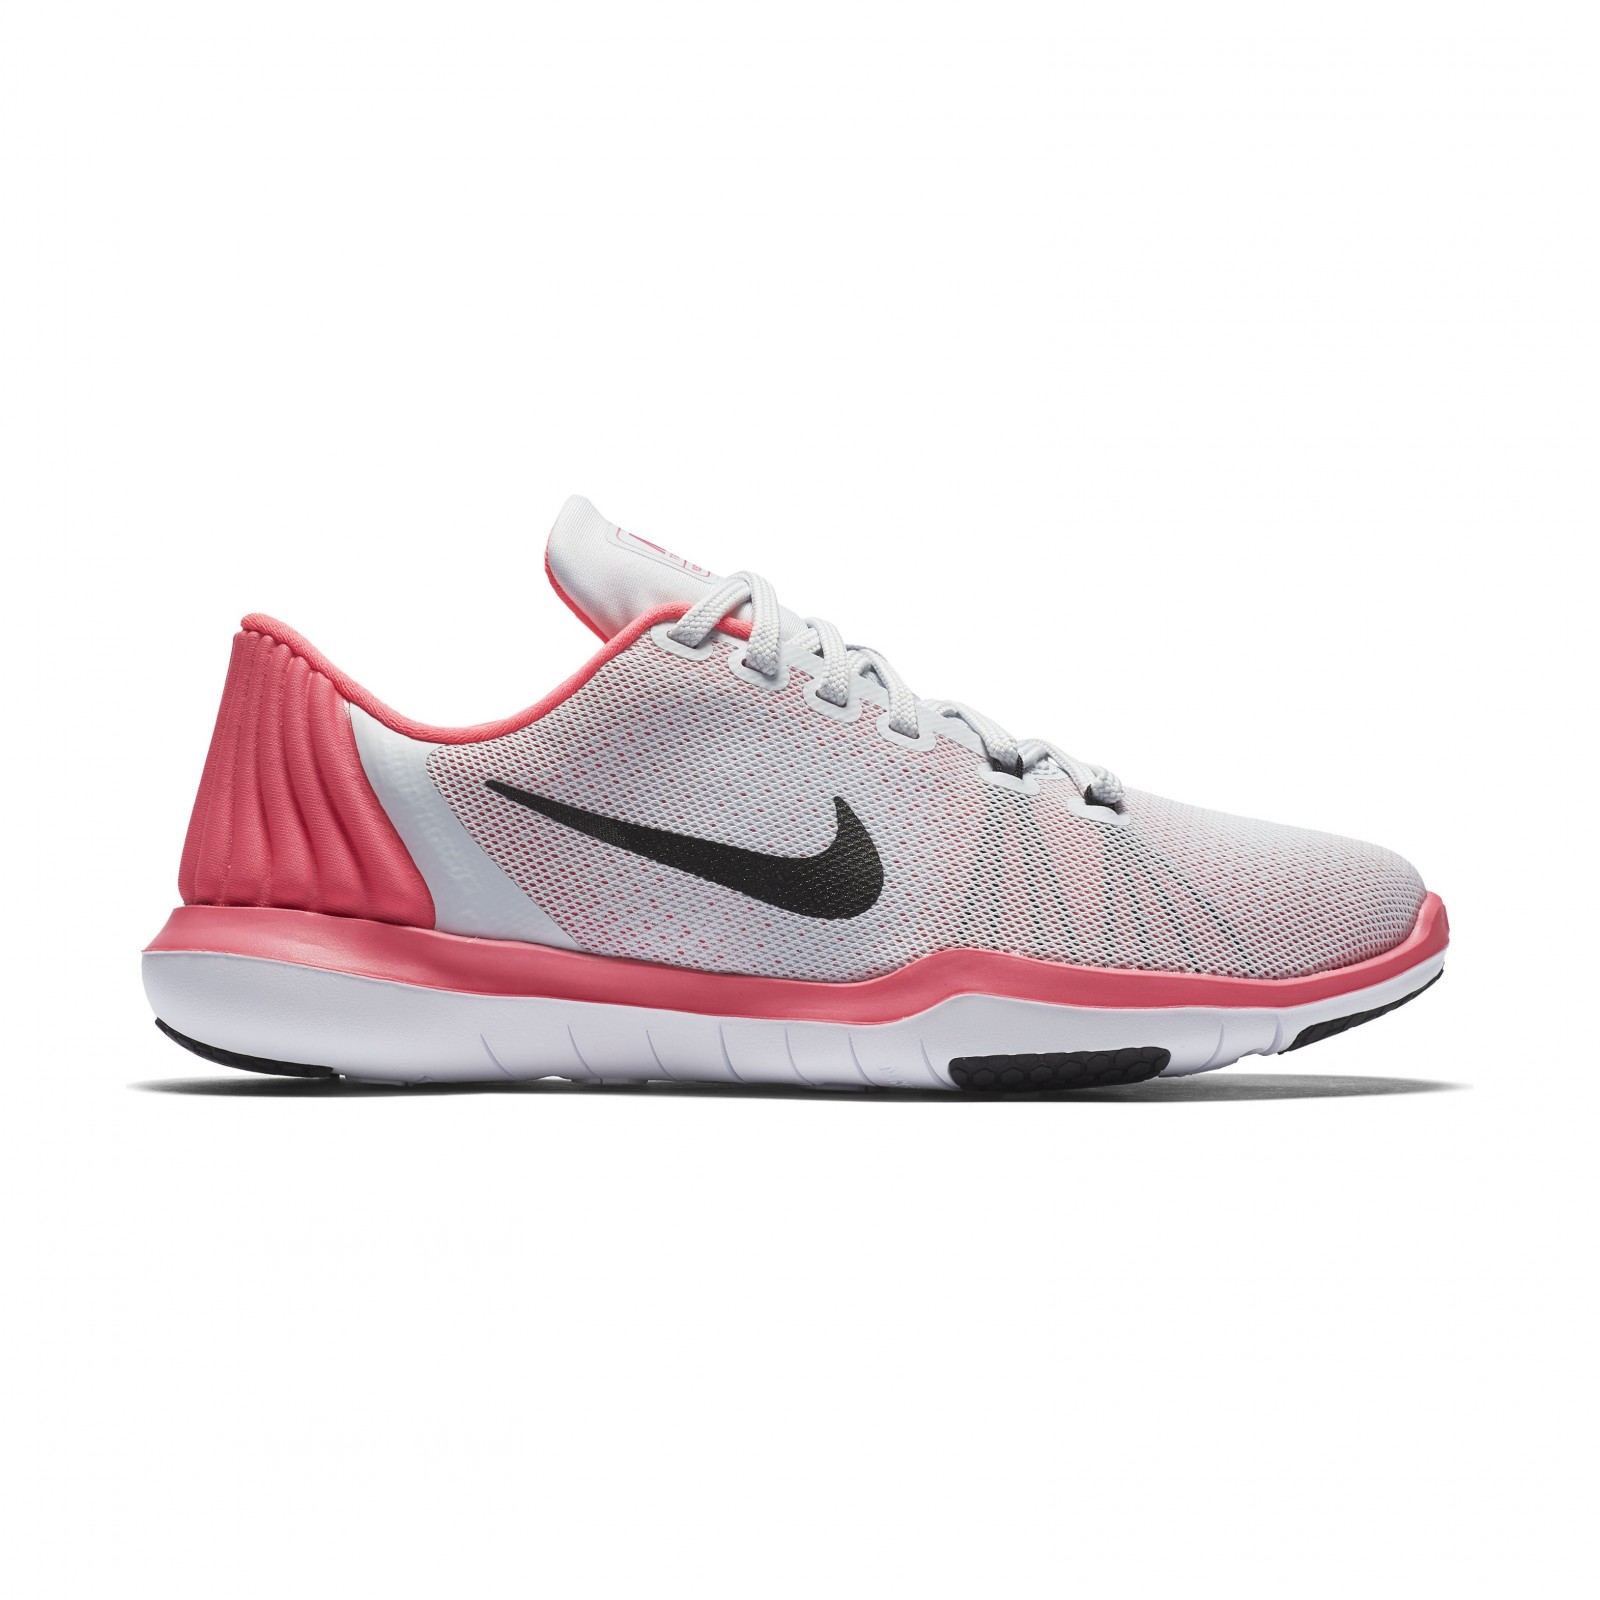 Dámské fitness boty Nike WMNS FLEX SUPREME TR 5  8a24e3ec84